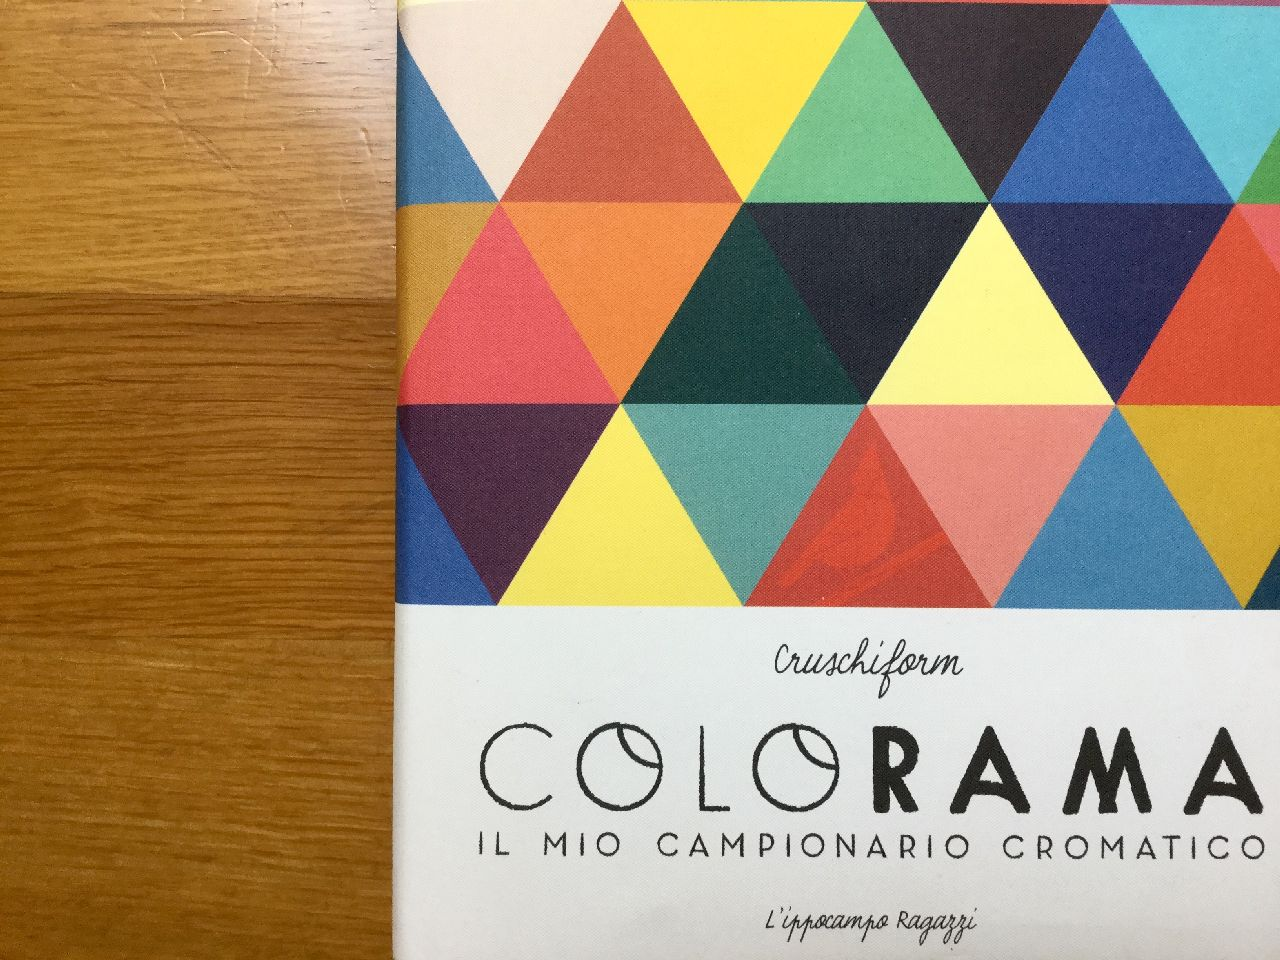 Cruschiform, Colorama, L'ippocampo